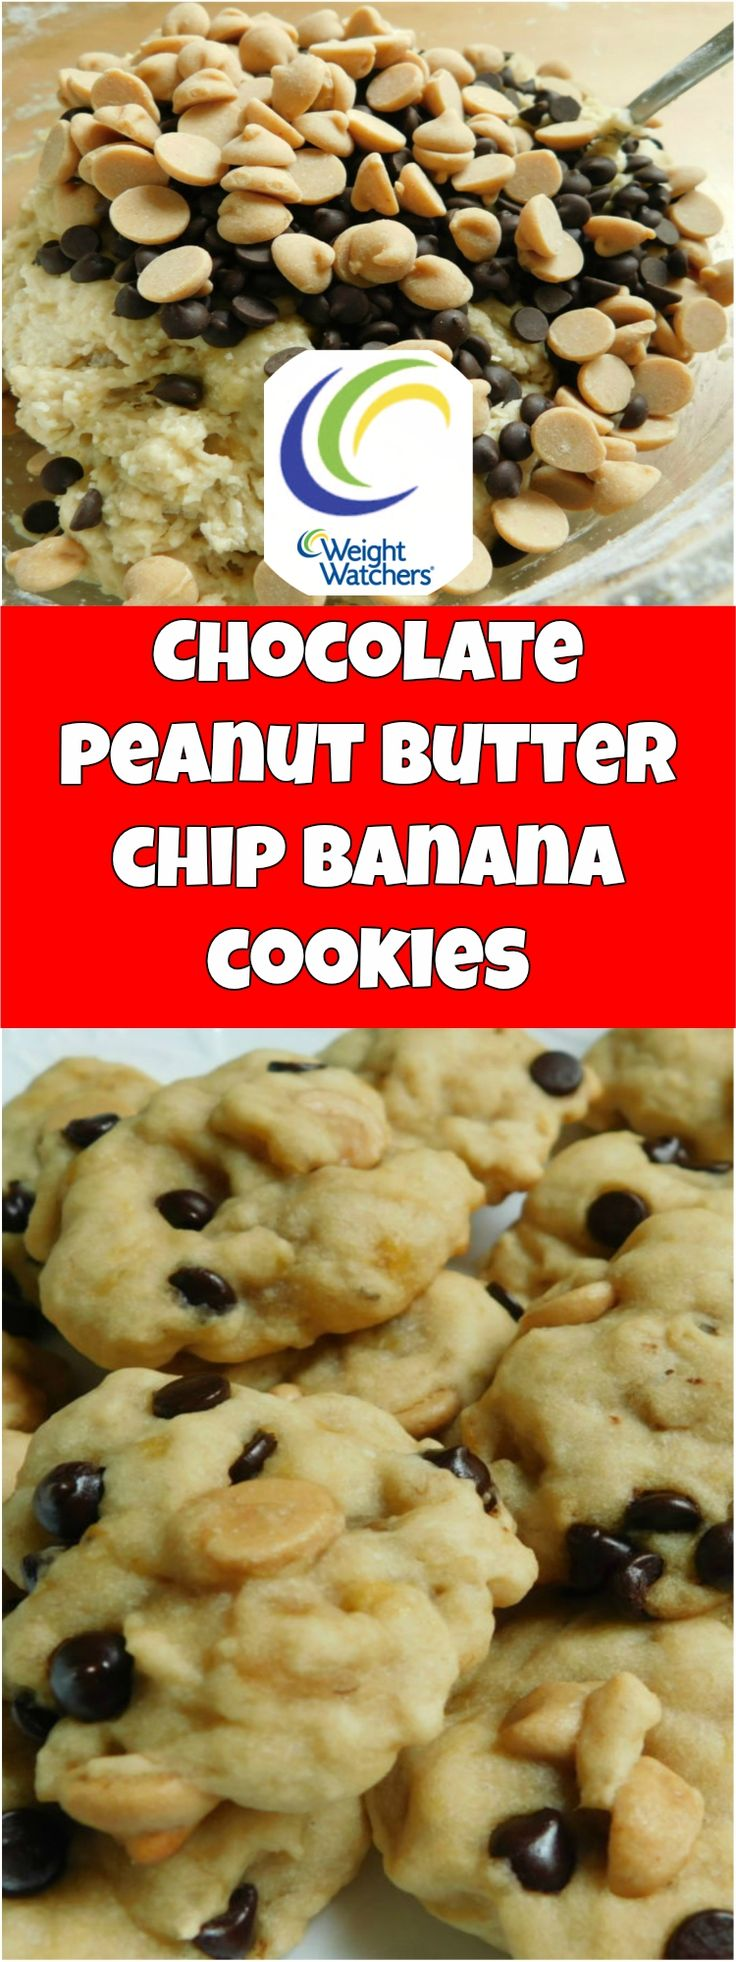 Chocolate peanut butter chip banana cookies weight watchers smartpoints 2